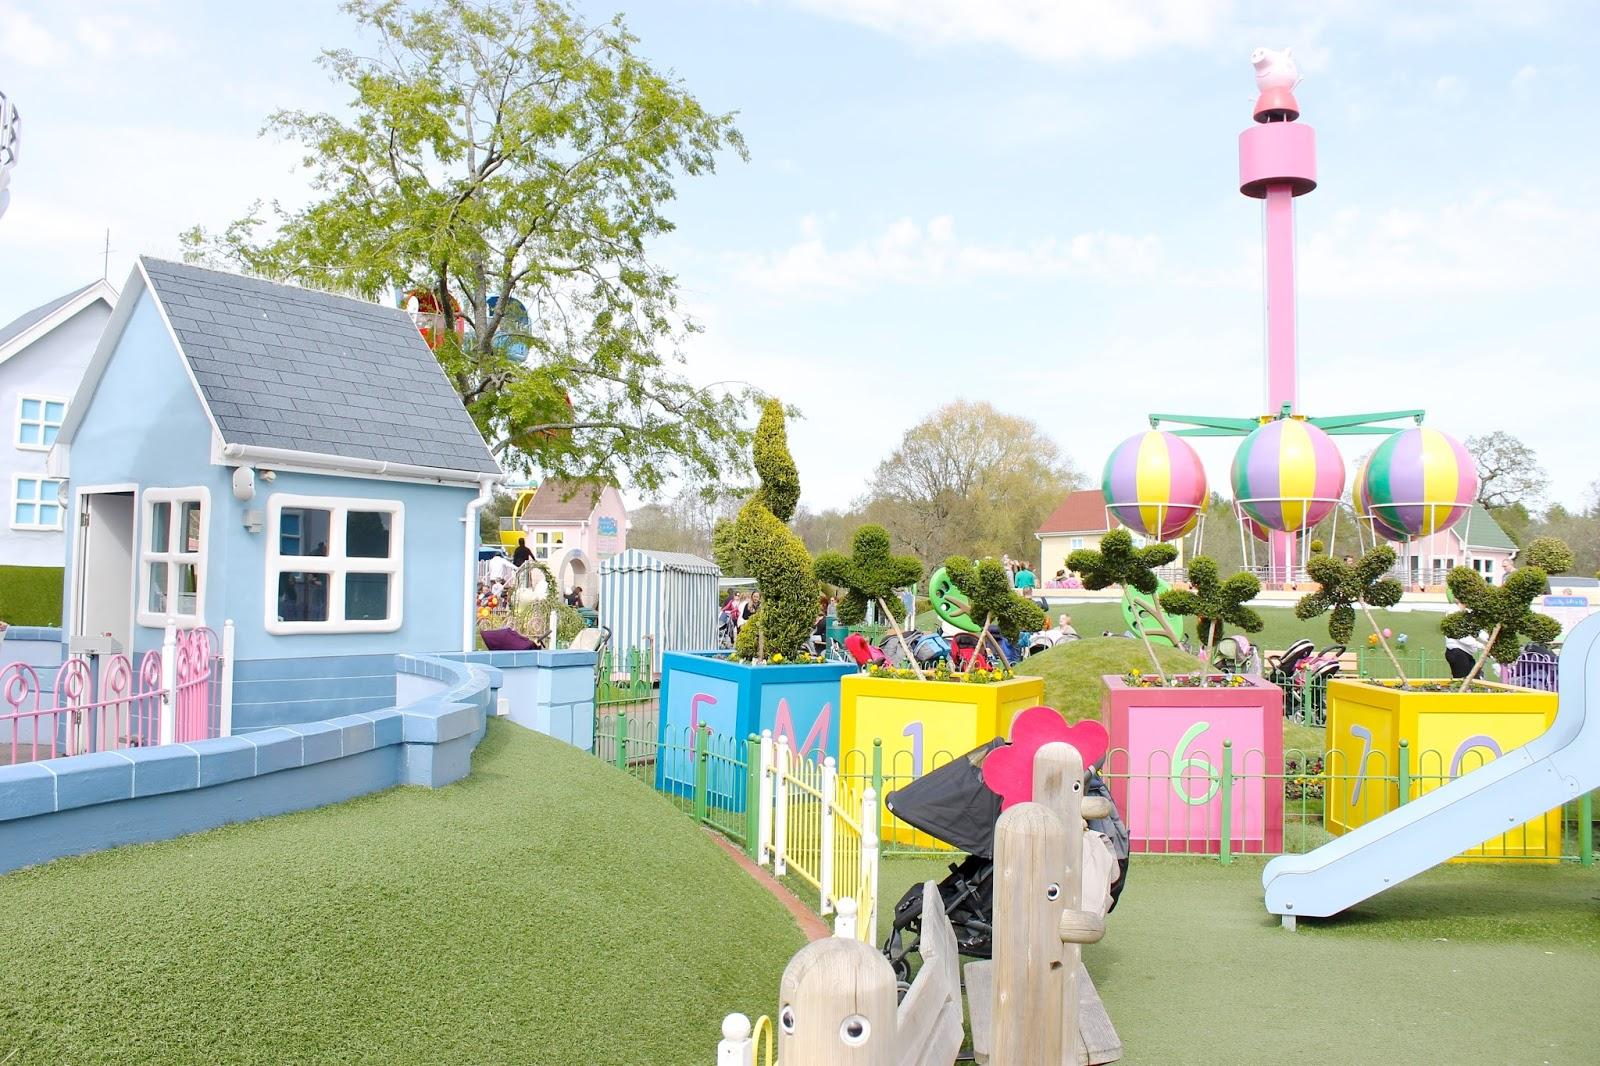 review of paultons park peppa pig world an award. Black Bedroom Furniture Sets. Home Design Ideas